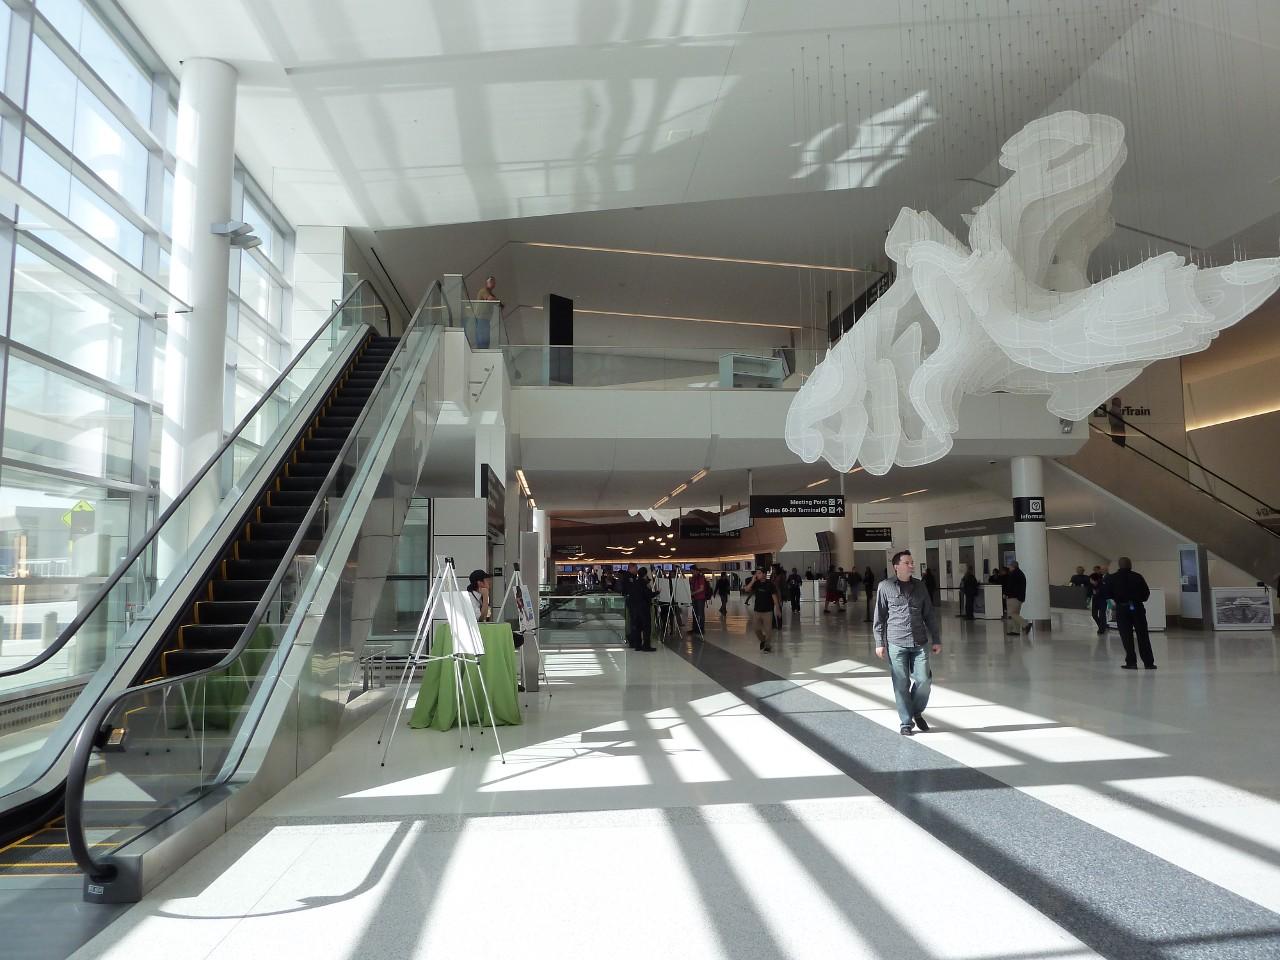 20110409-sfo-t2-departures-lobby-2